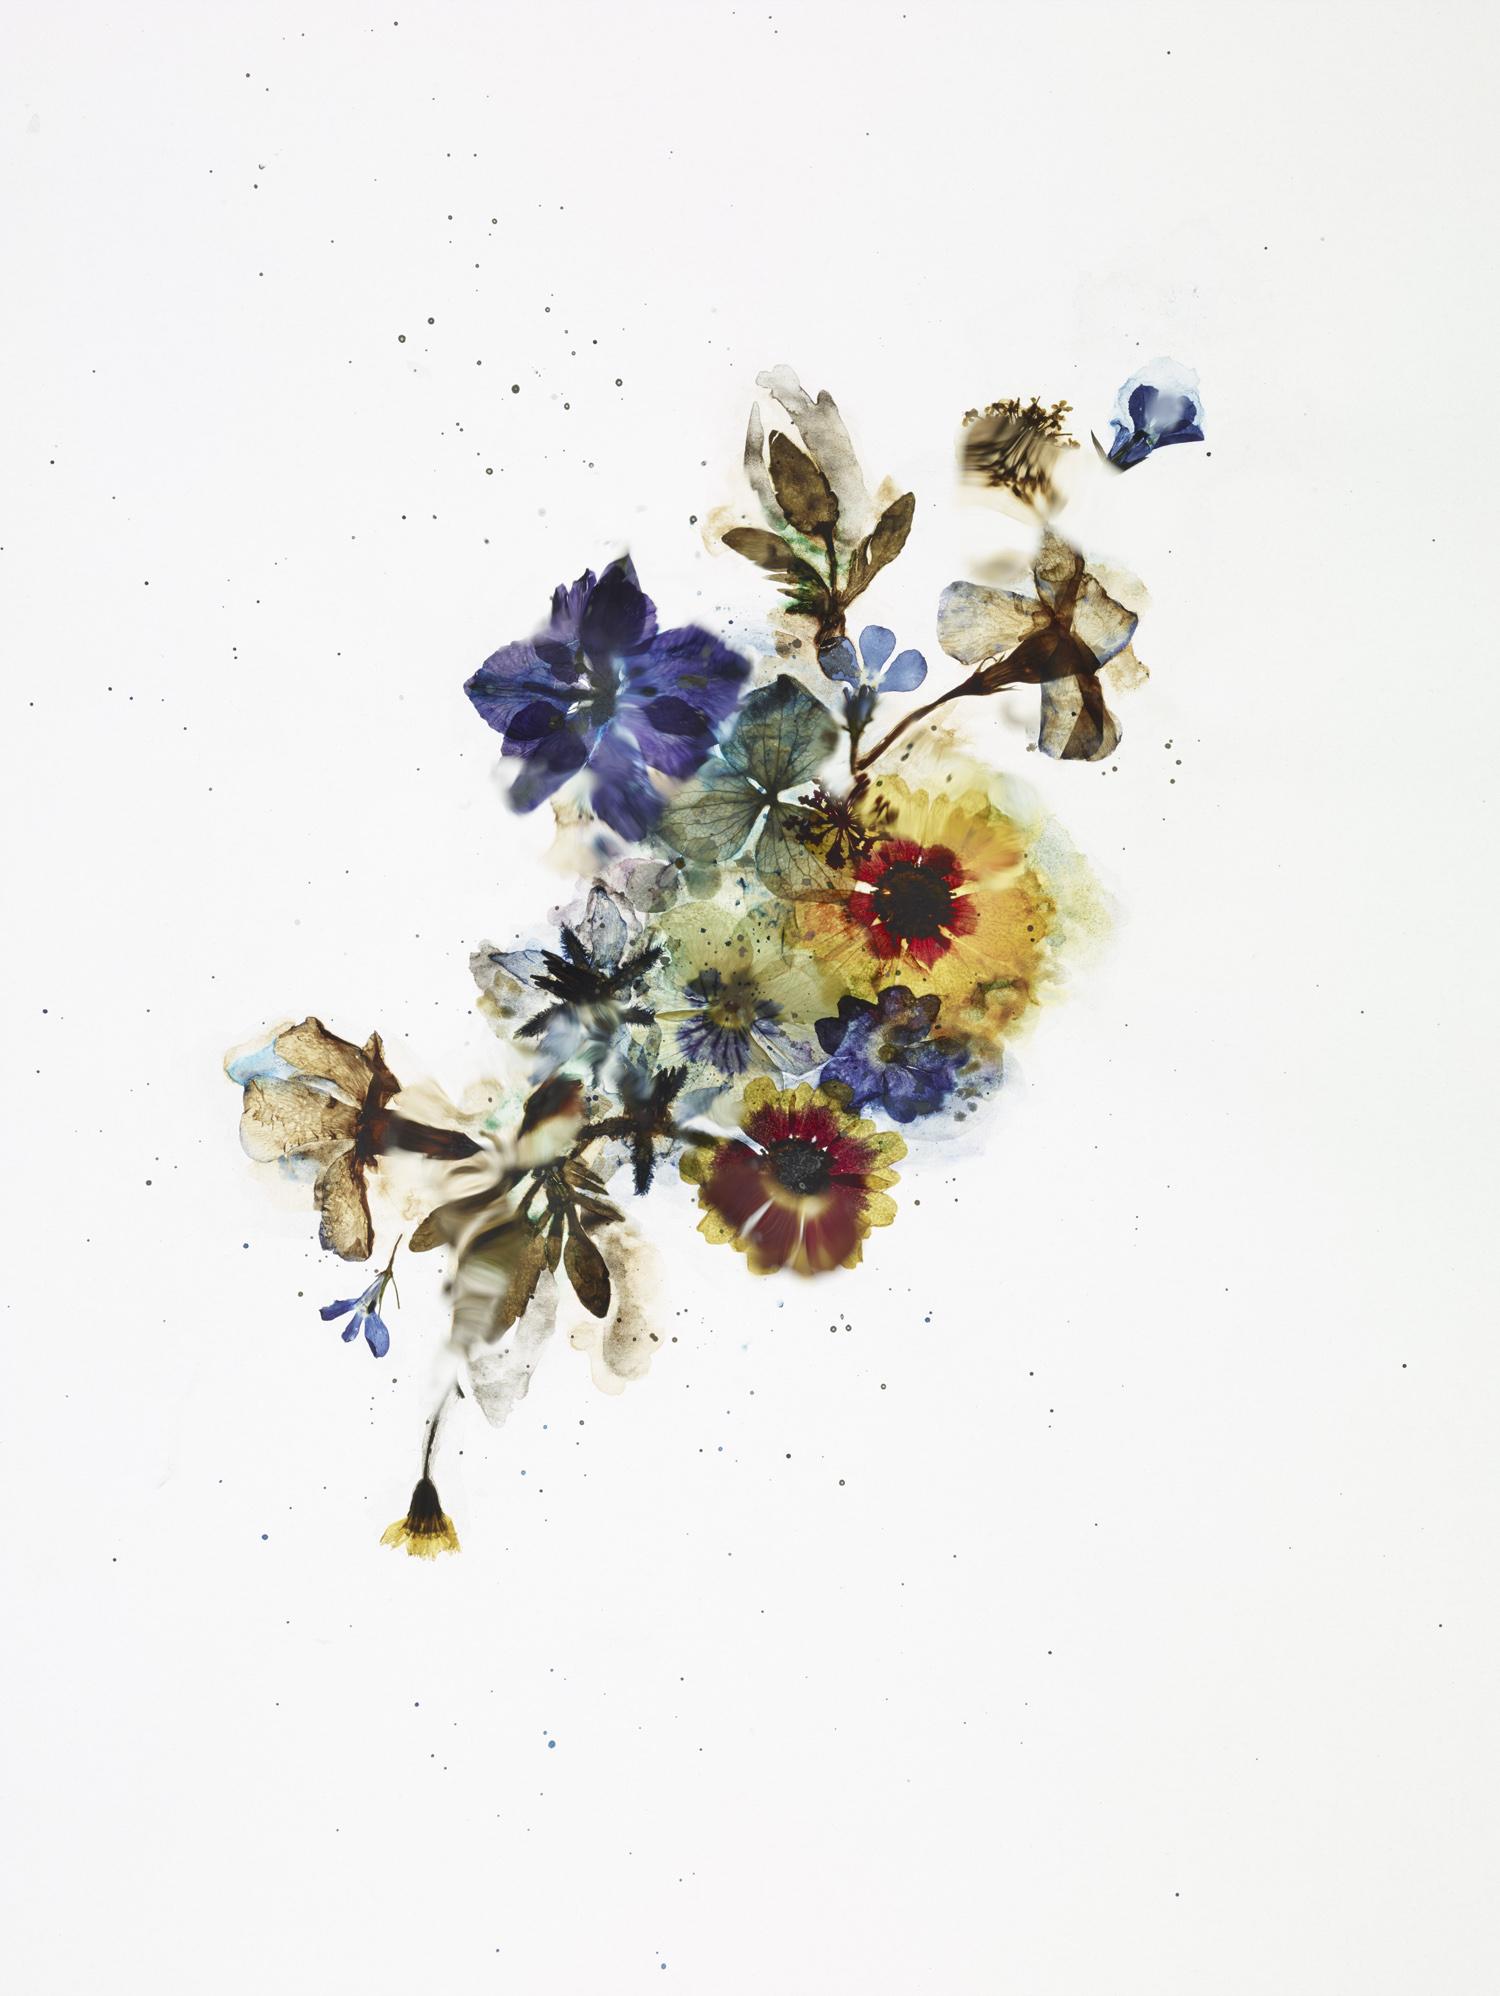 rf4201_dried_flower_test_s04_026